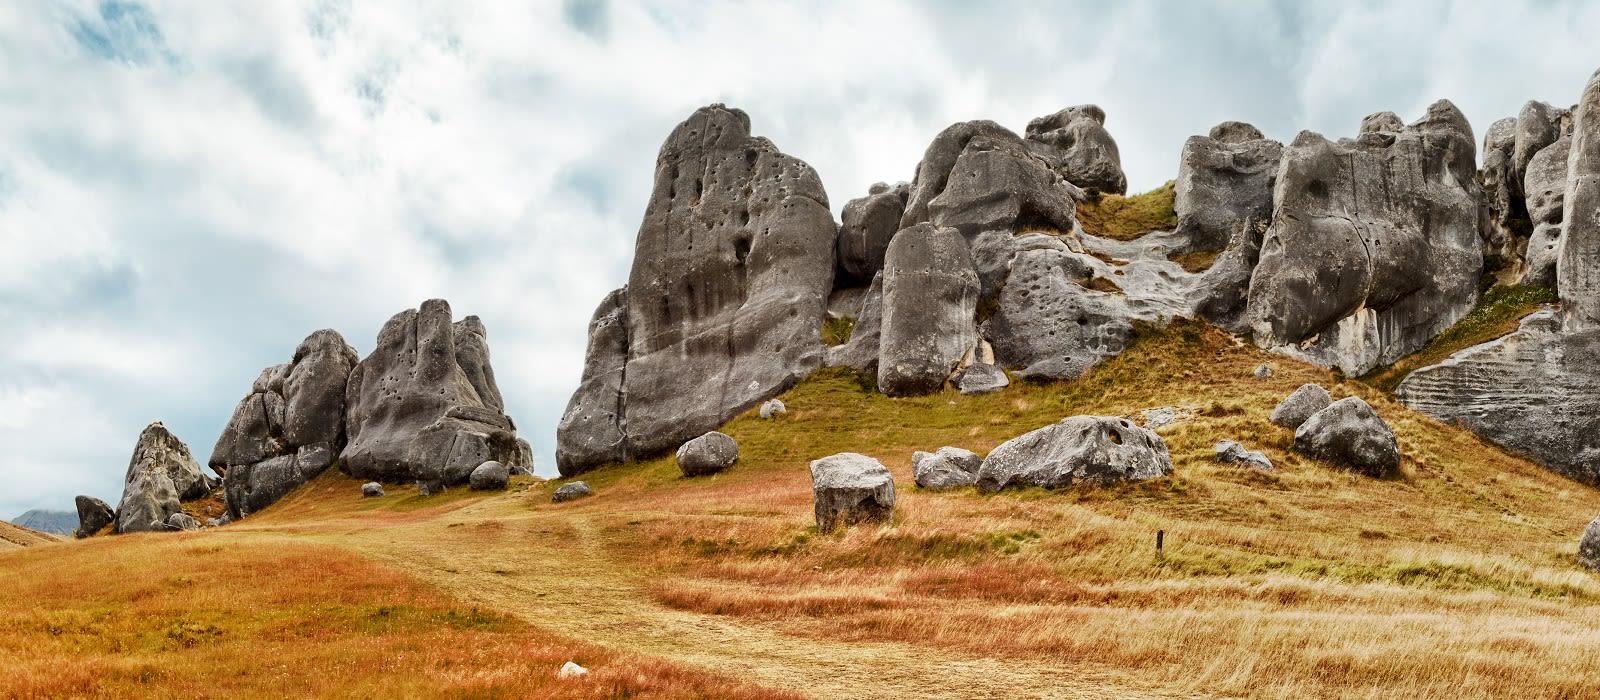 New Zealand: Landscapes, Culture and Beach Tour Trip 8